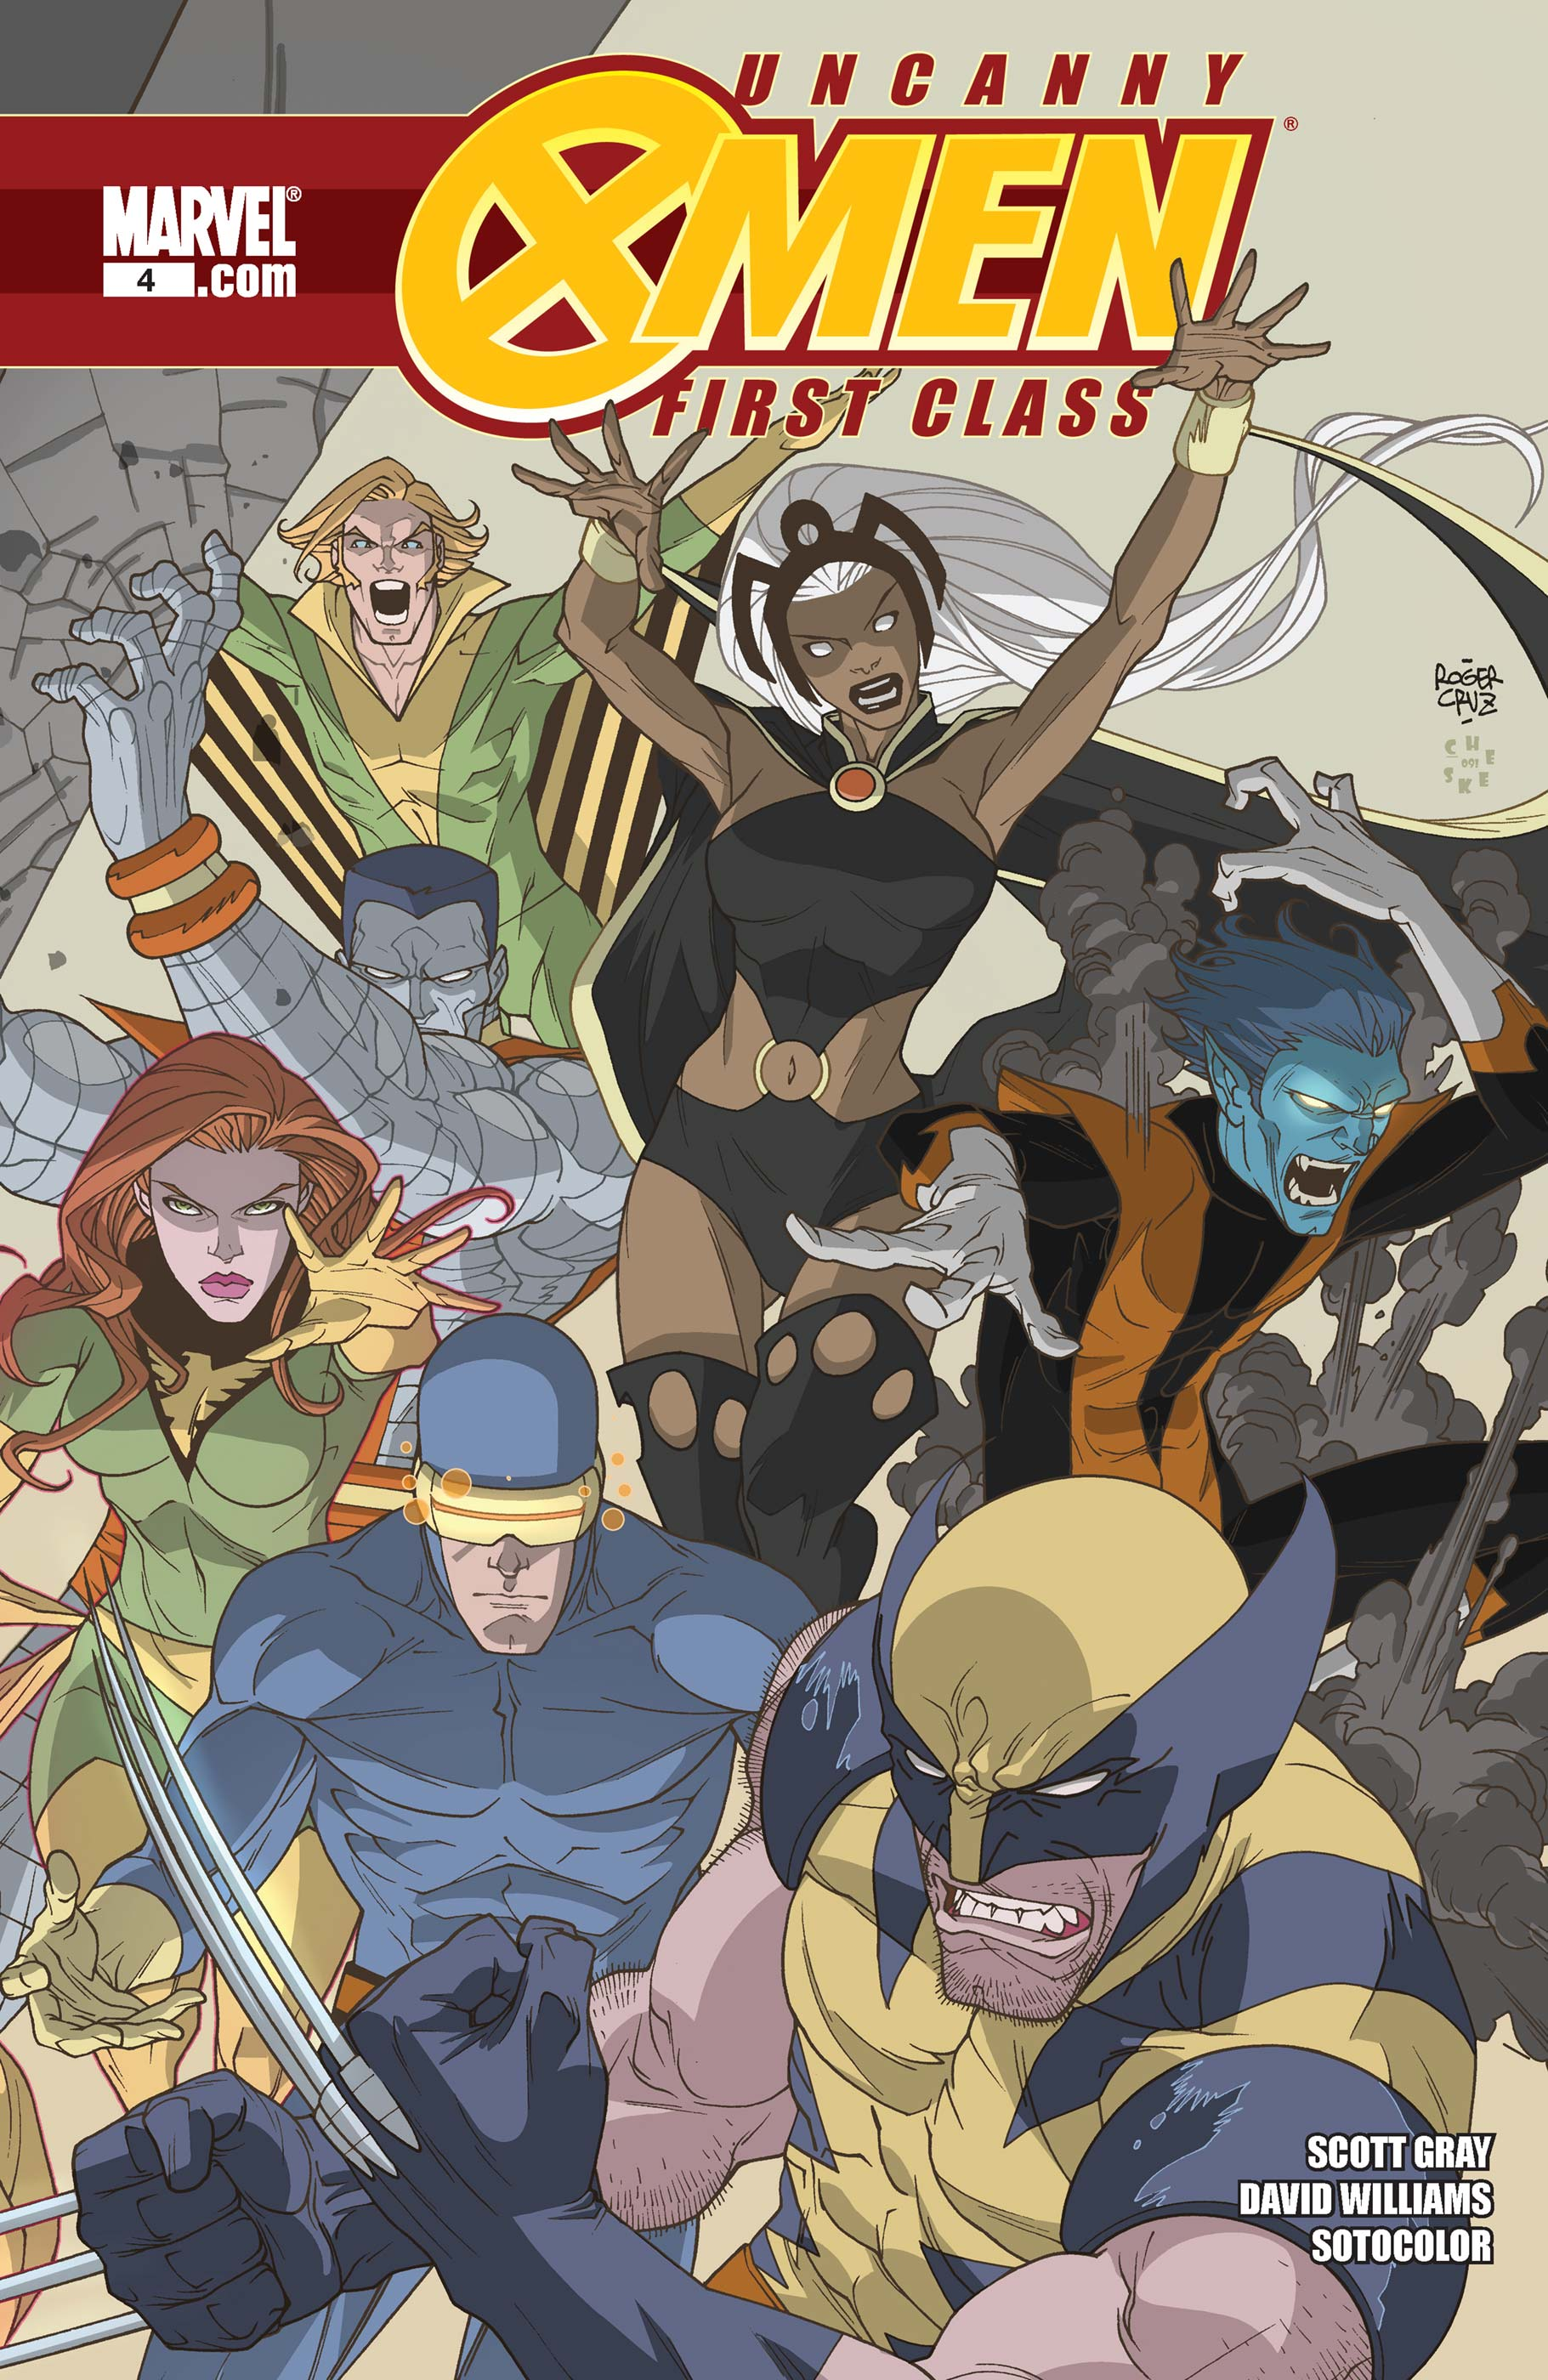 Uncanny X-Men: First Class (2009) #4